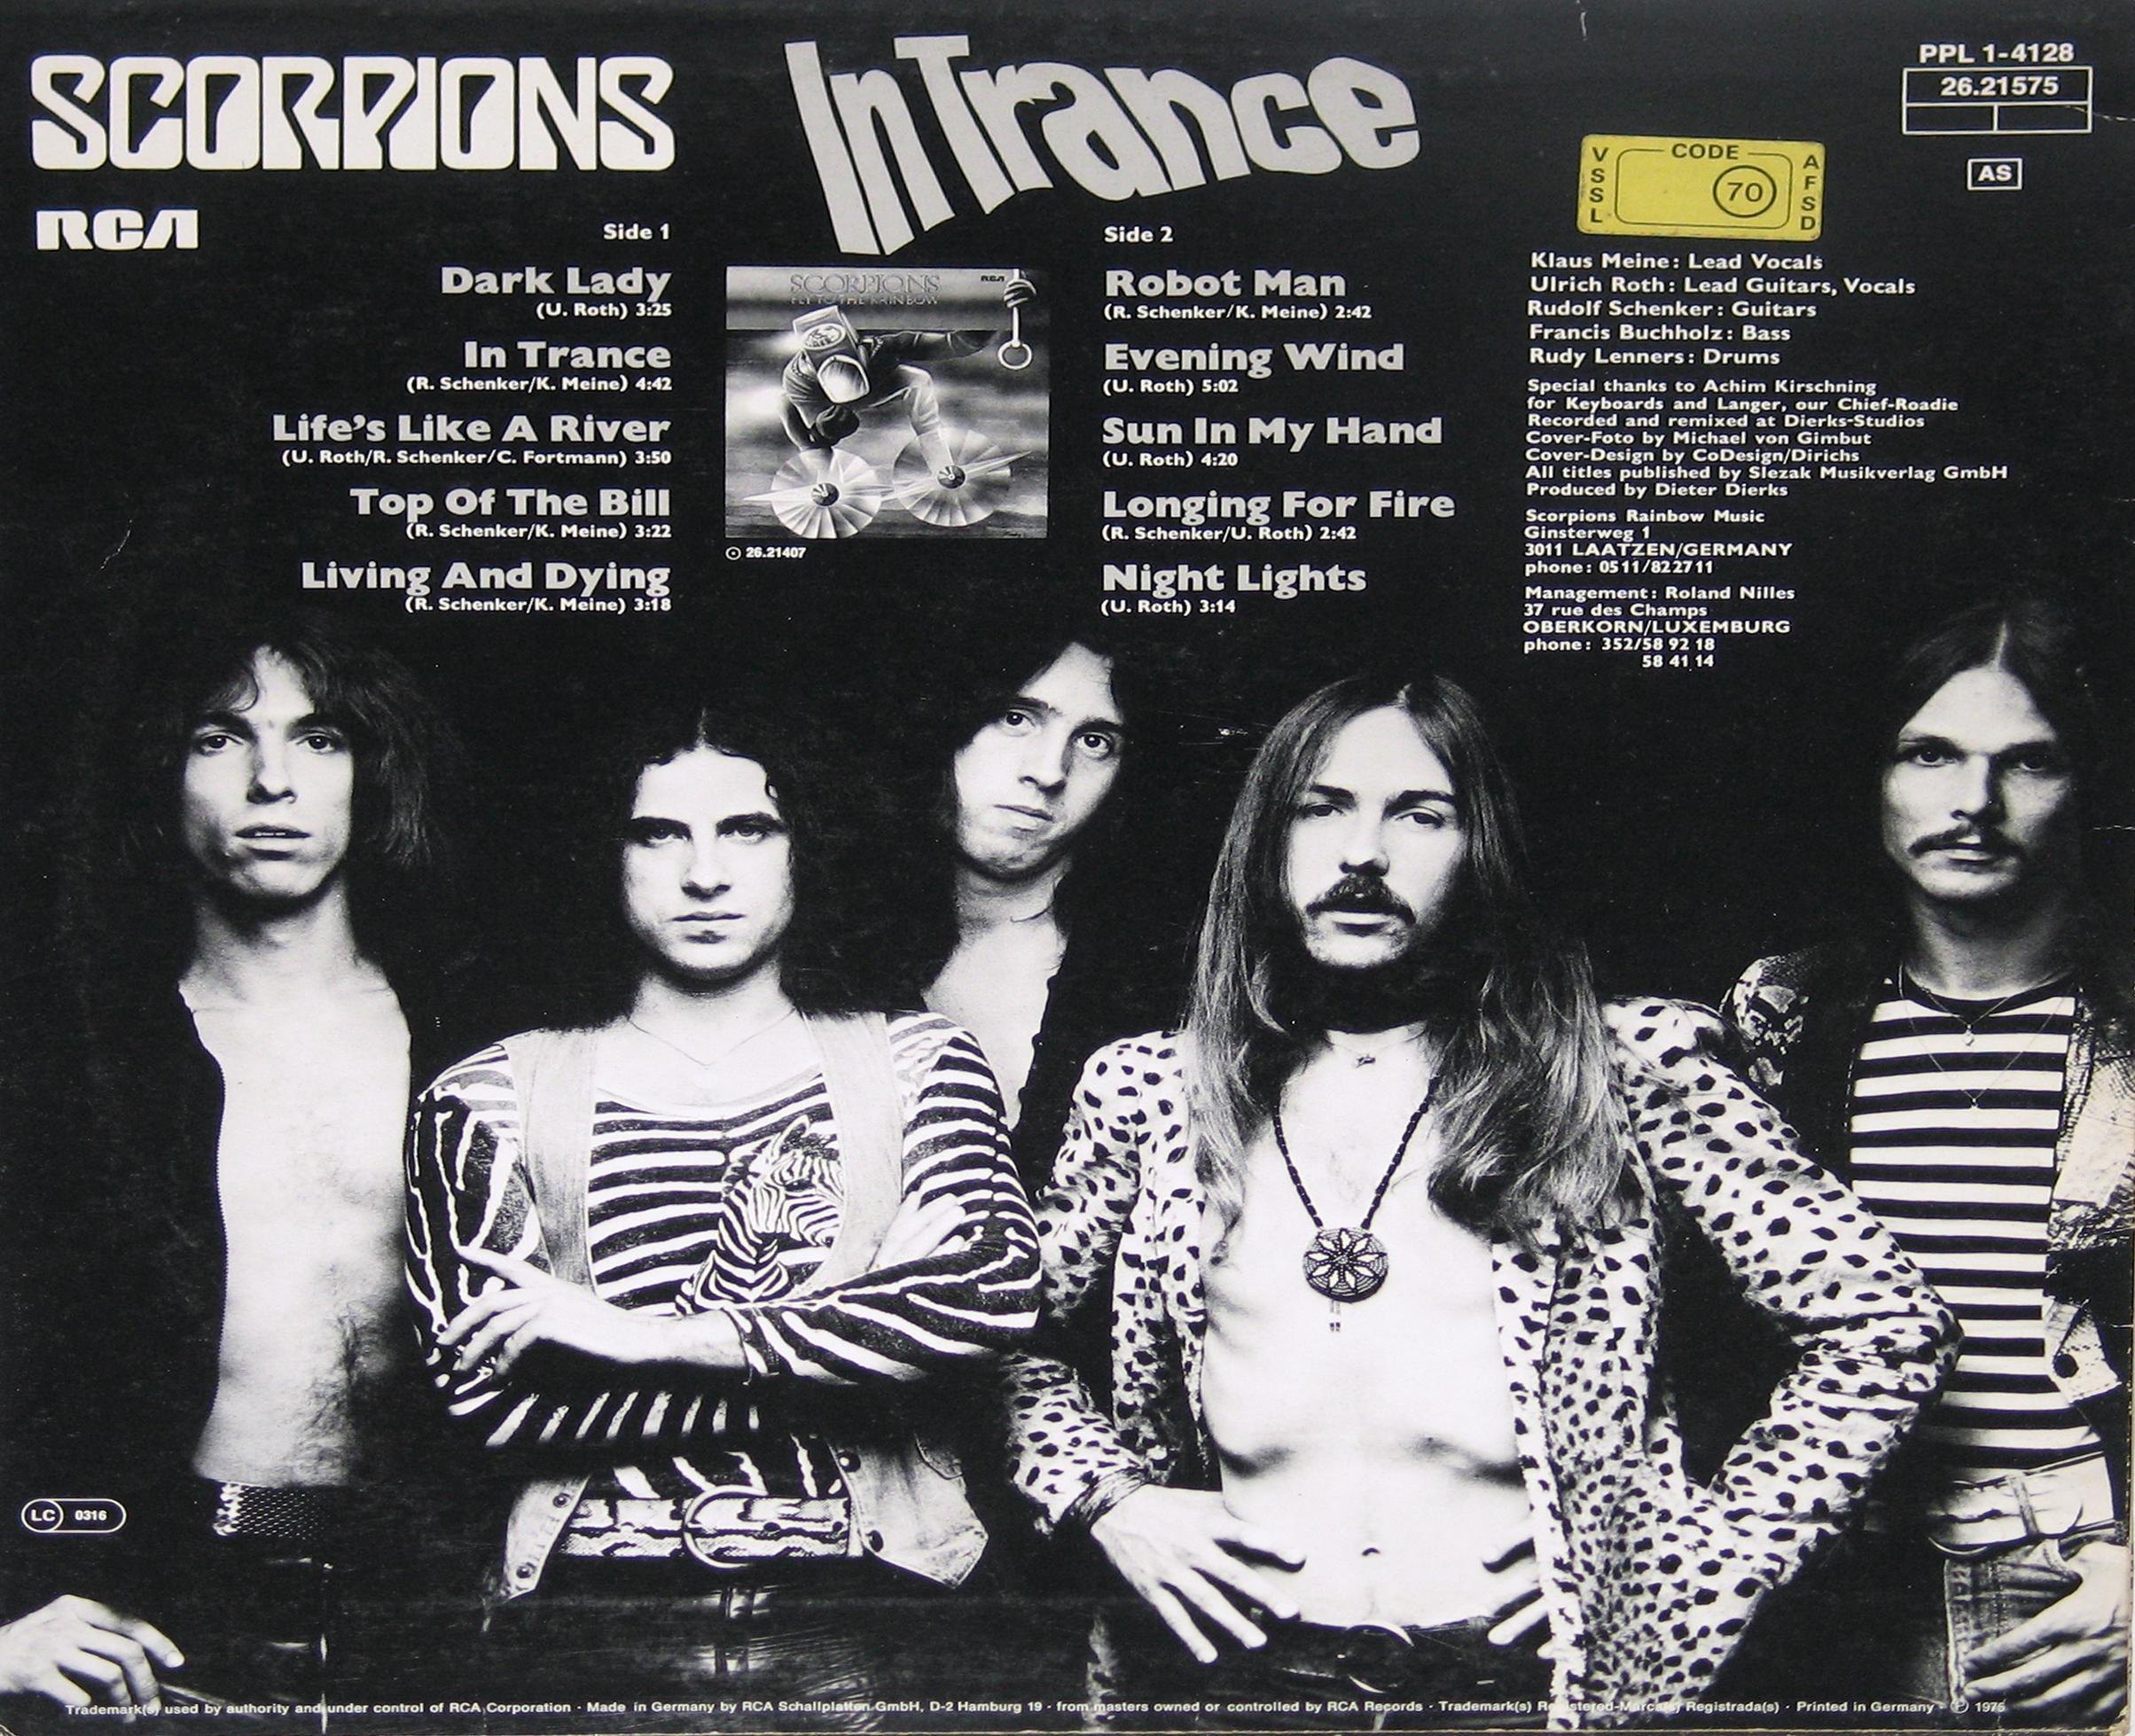 Scorpions In Trance uncensored breast cover